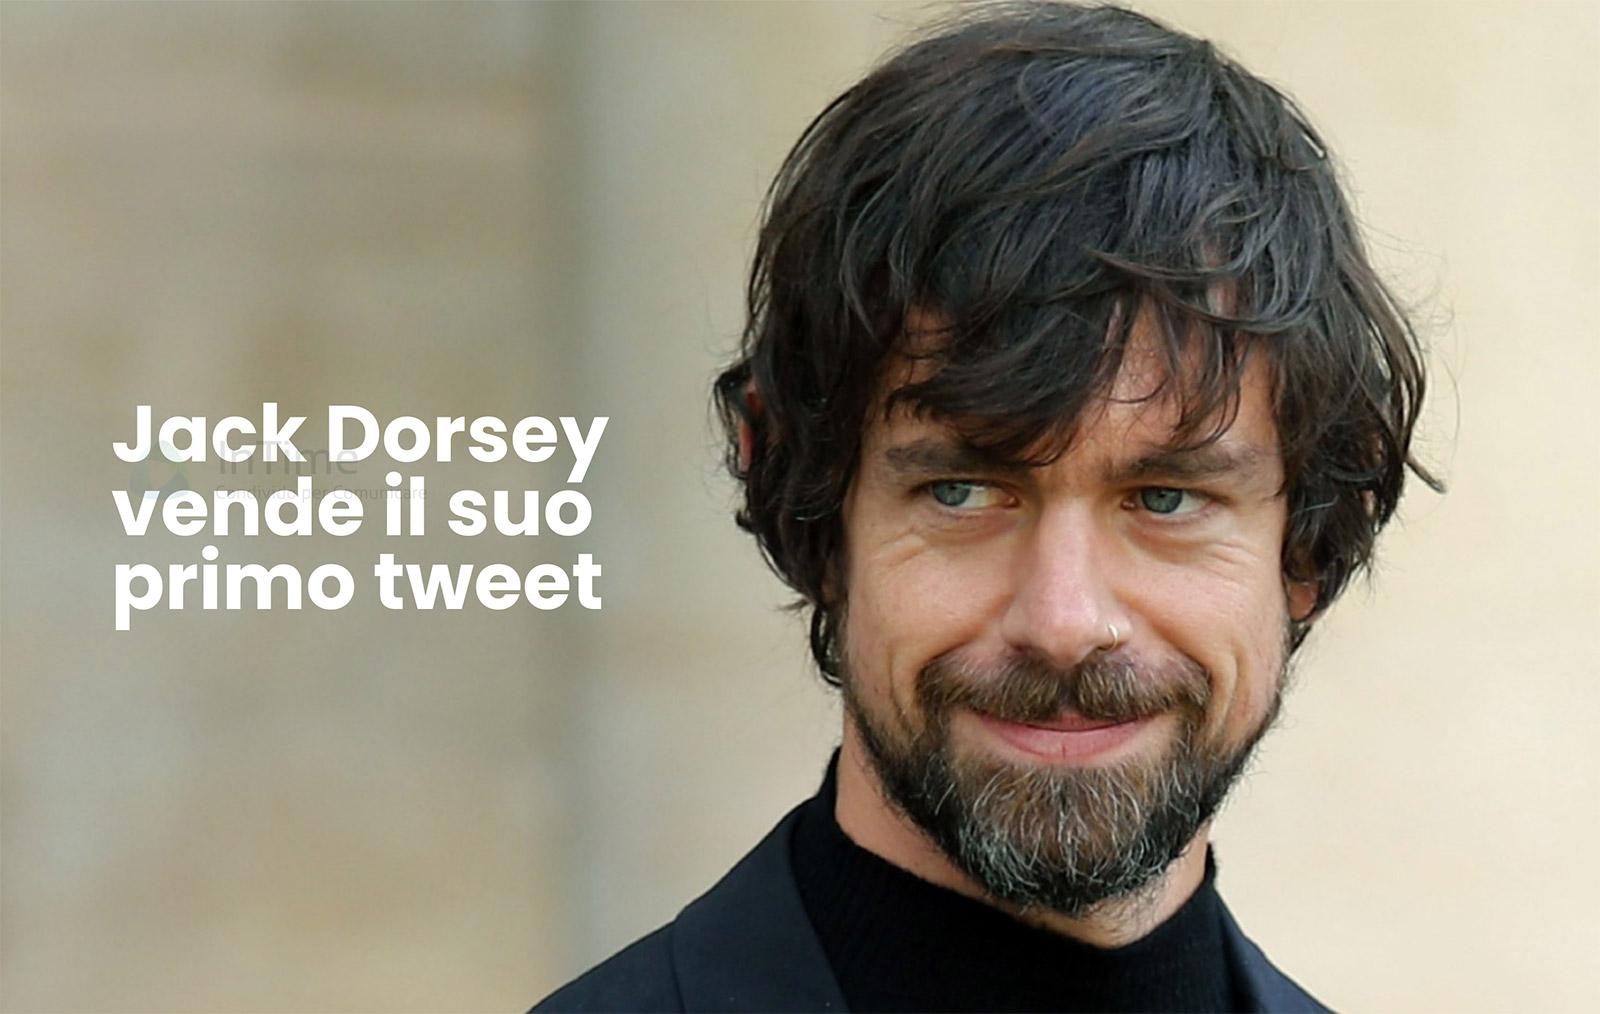 jack dorsey twitter primo tweet franzrusso.it